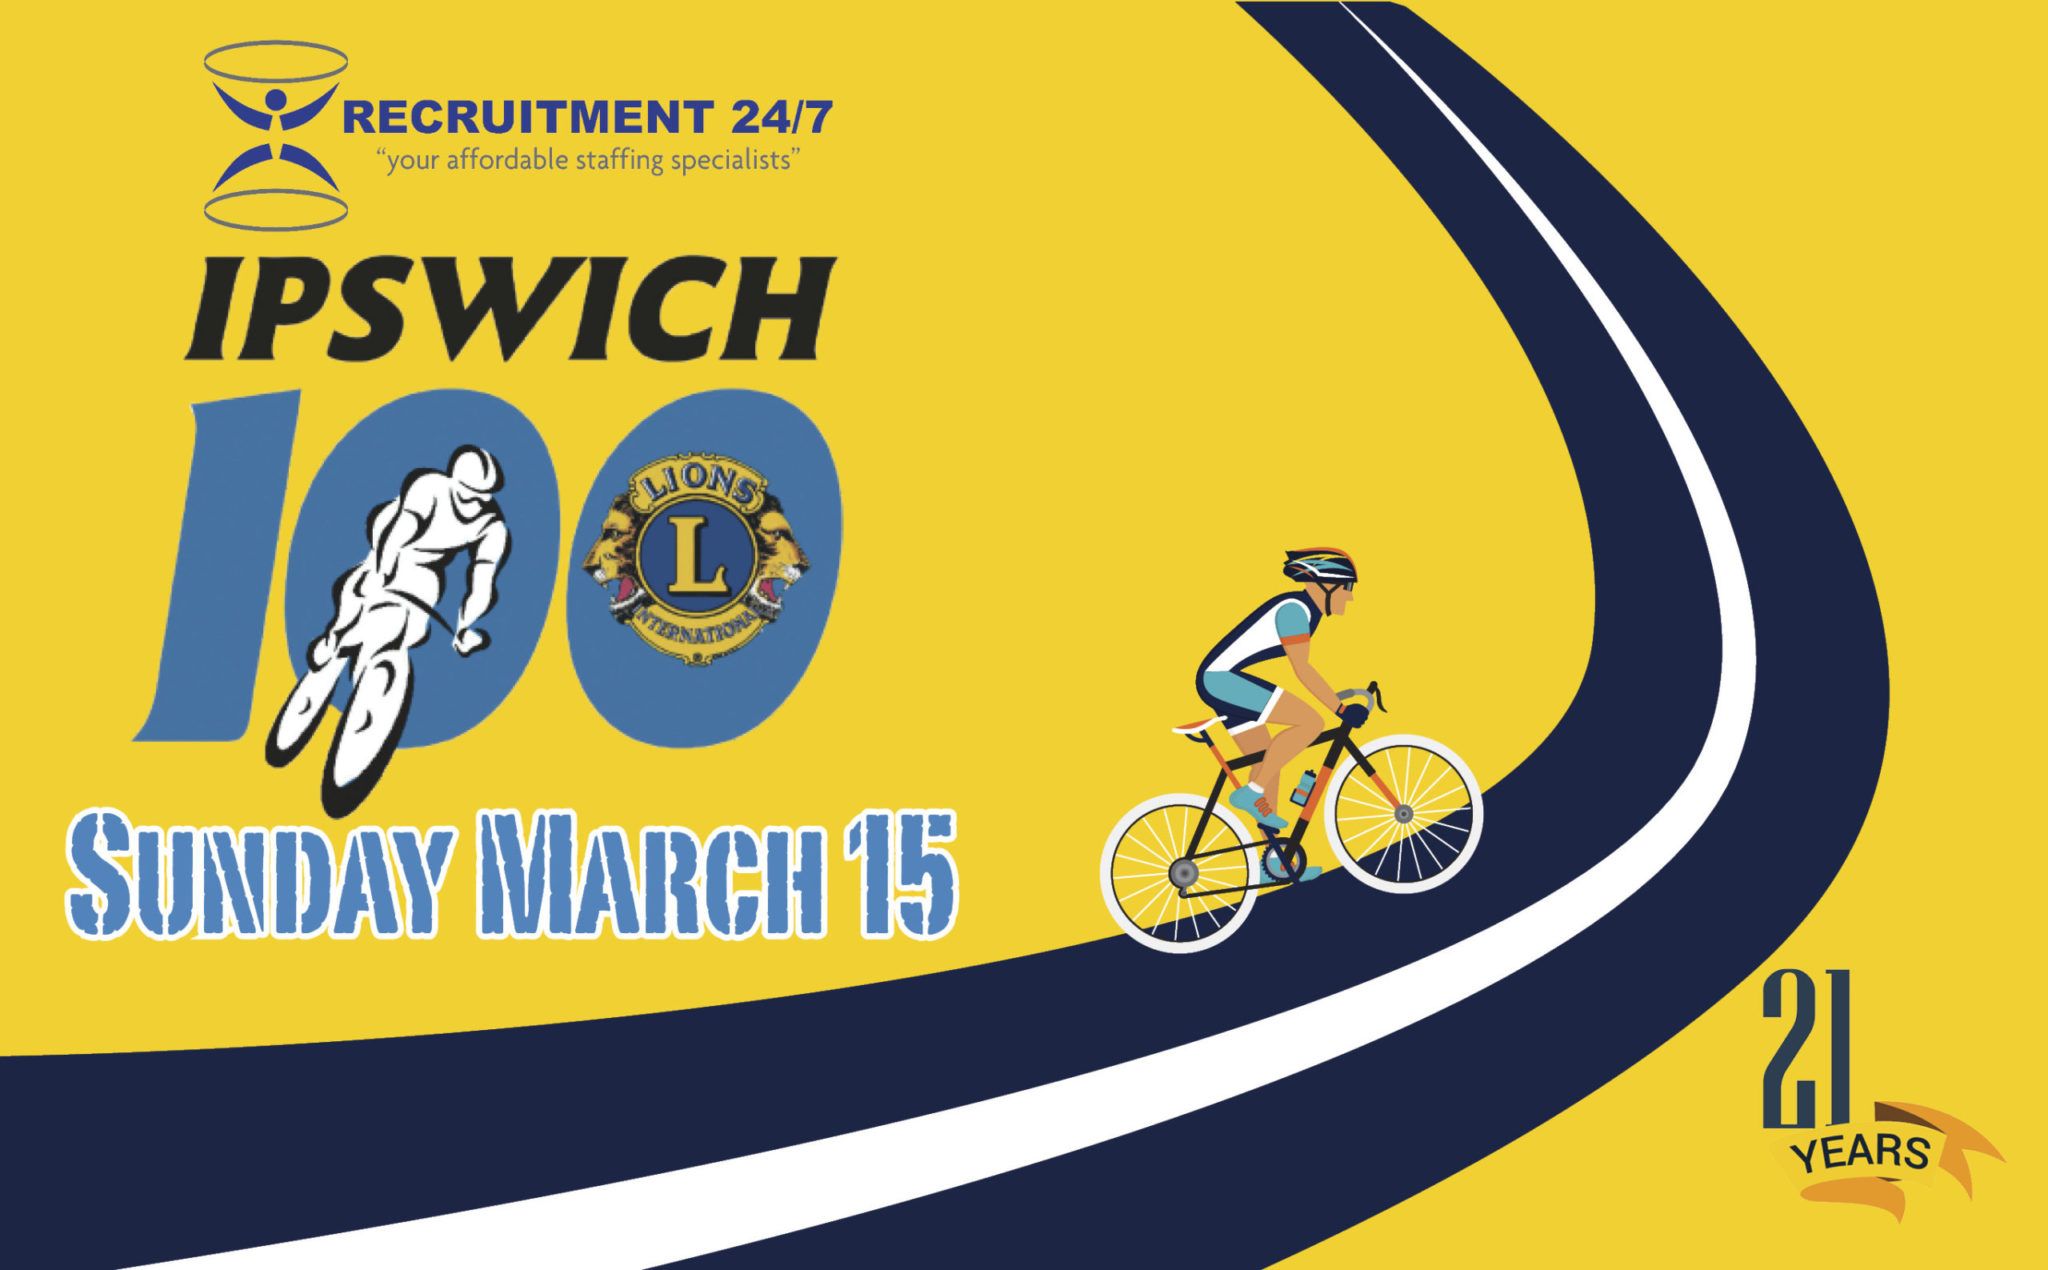 Ipswich 100 Event